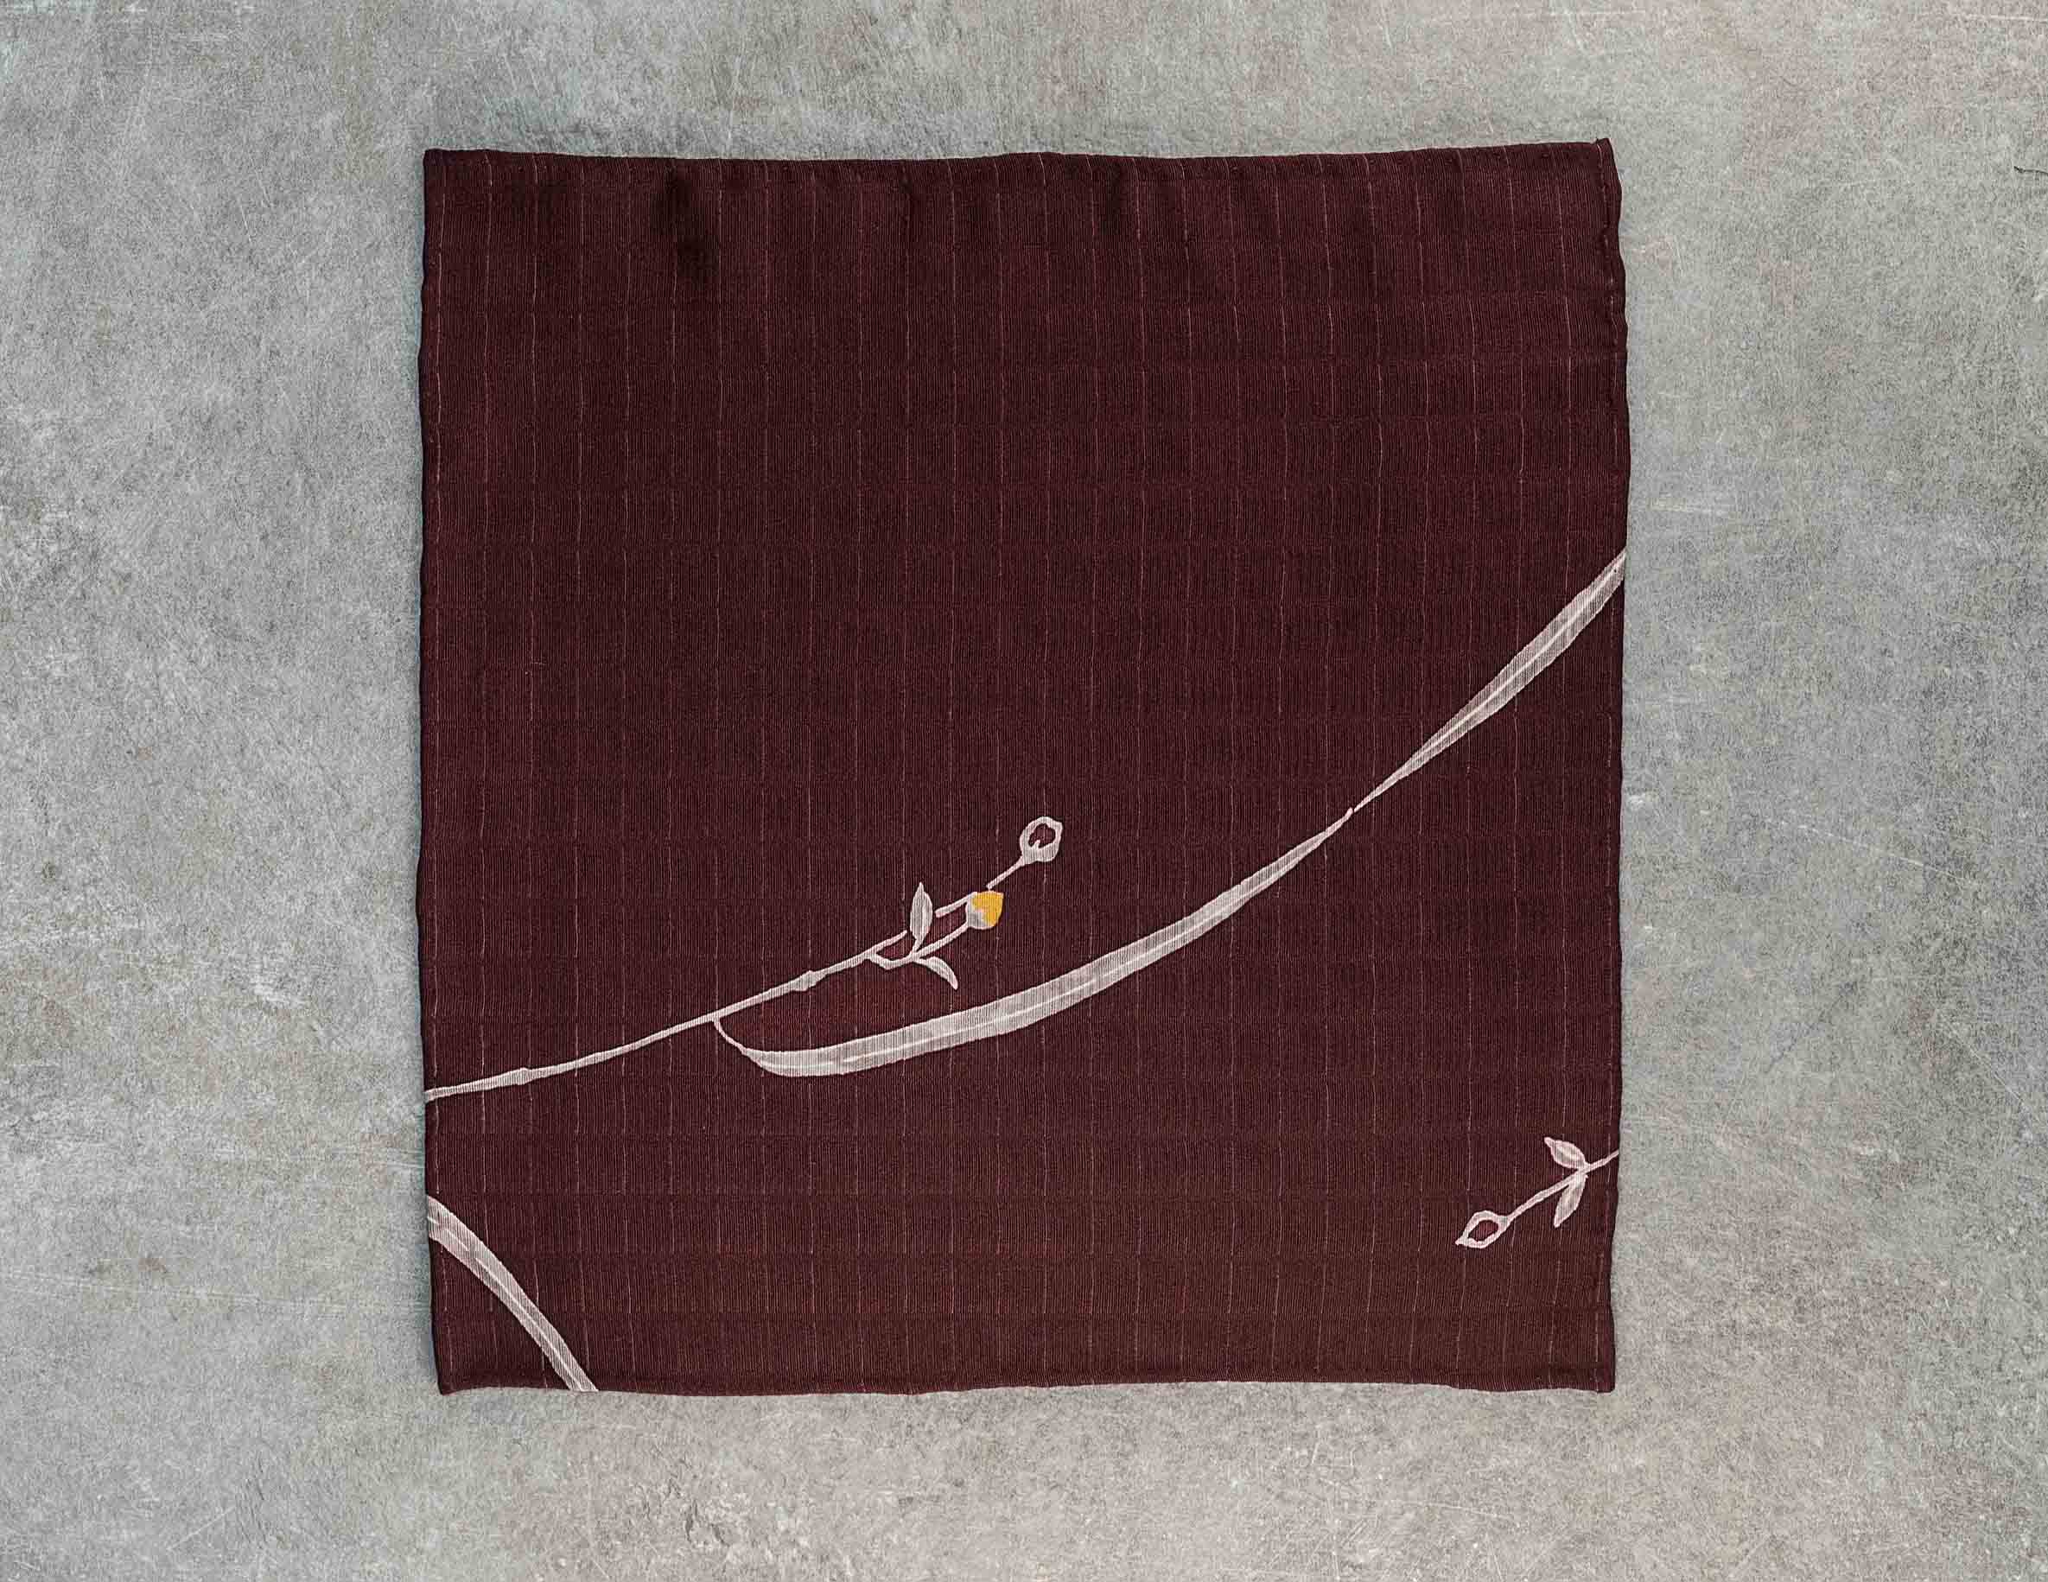 Fazzoletto da taschino in seta giapponese Okotanope fantasia floreale grigio giallo